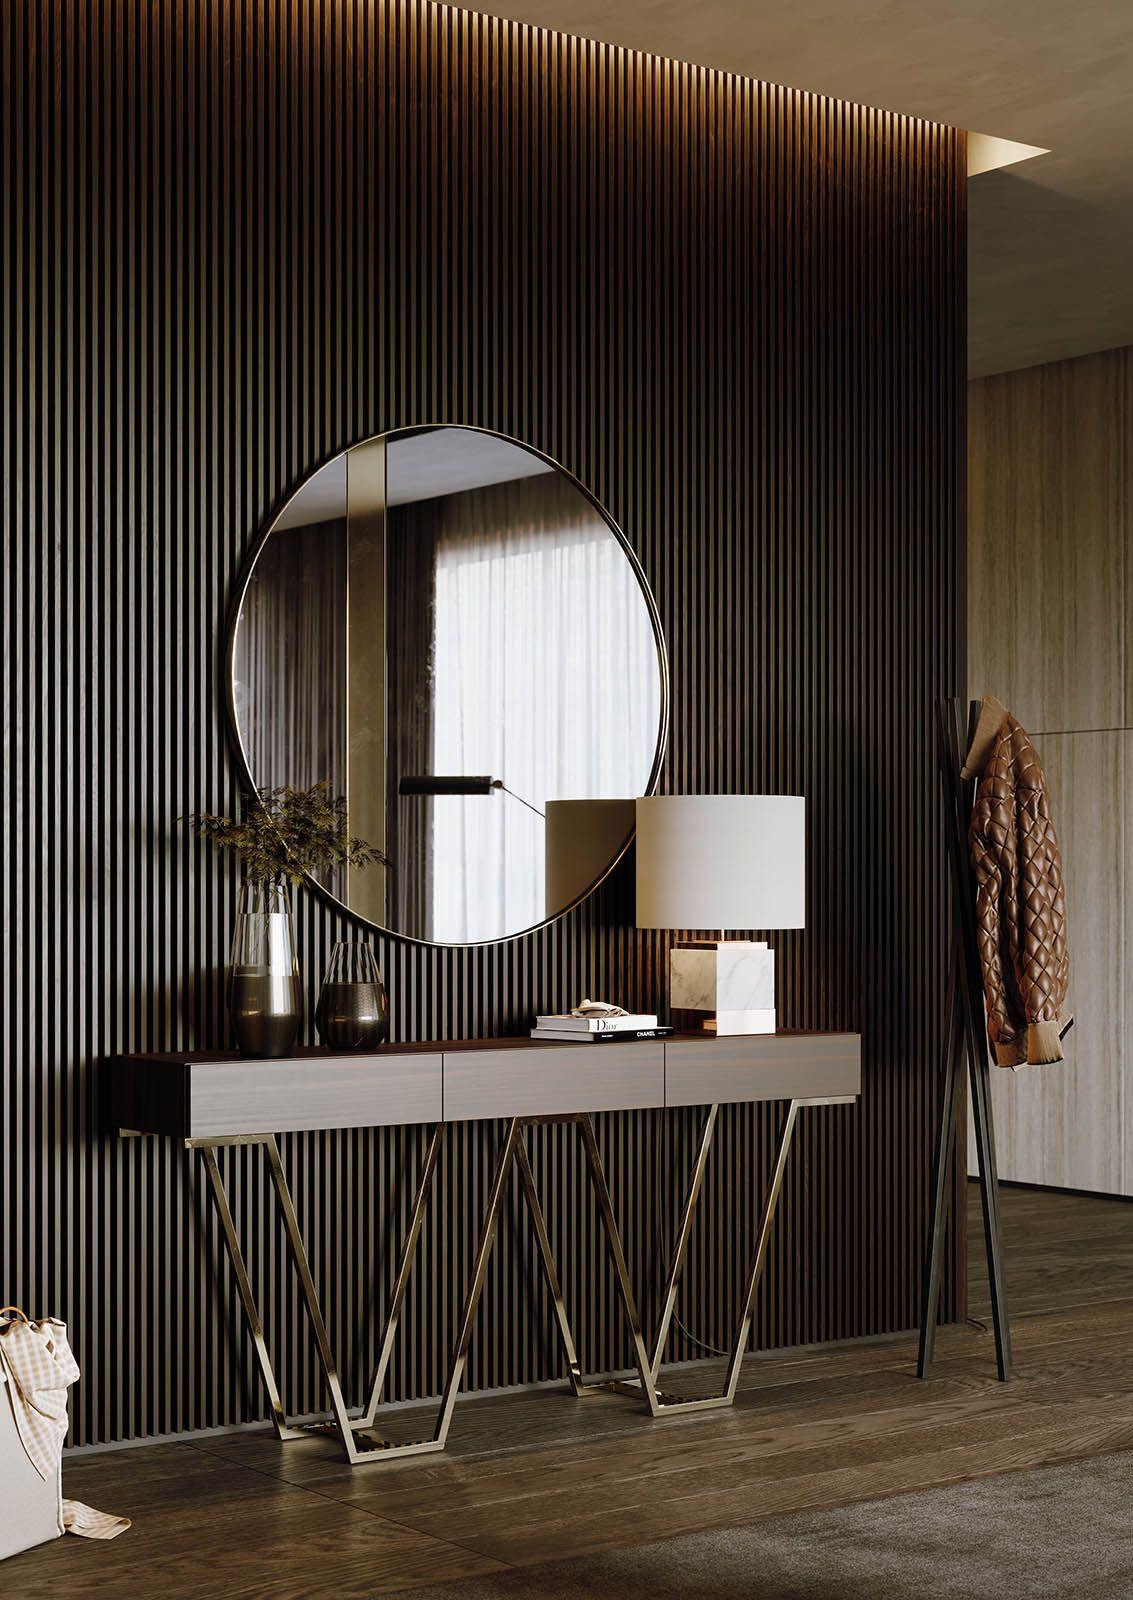 Laskasas Decorate Life Laskasas Com Living Room Ideas New 2019 Collection Contemporary Modern Home Interior Design Modern Houses Interior Hall Decor